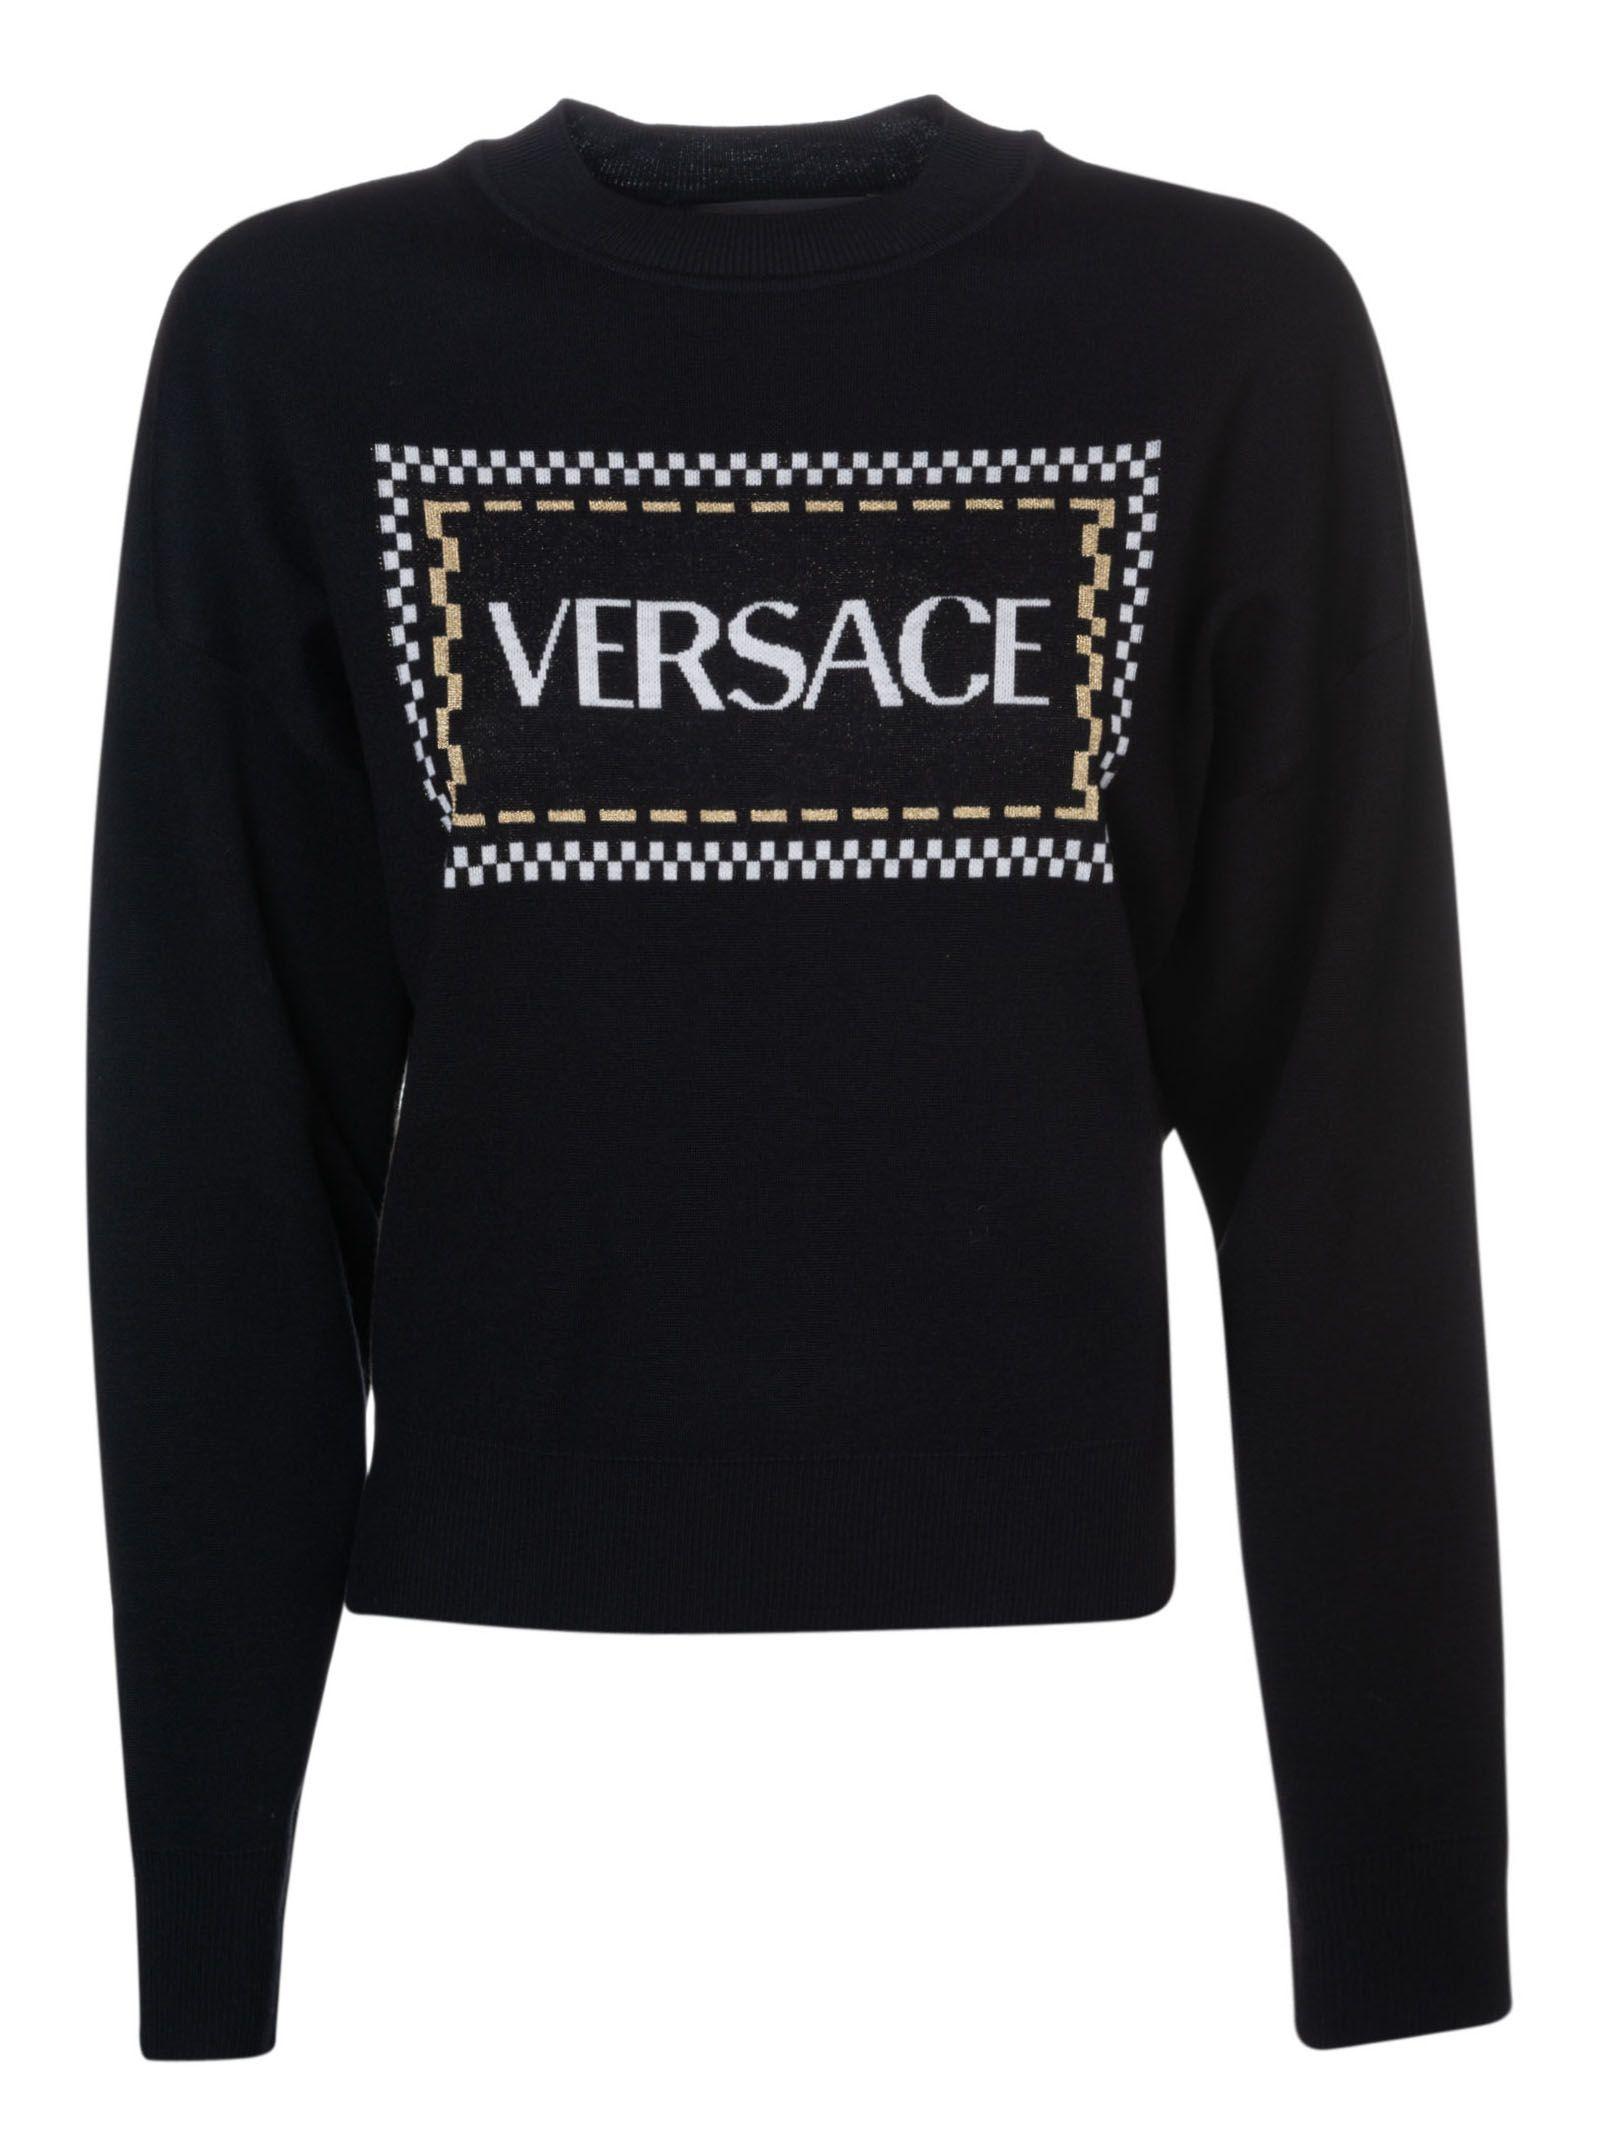 Versace Logo Sweater